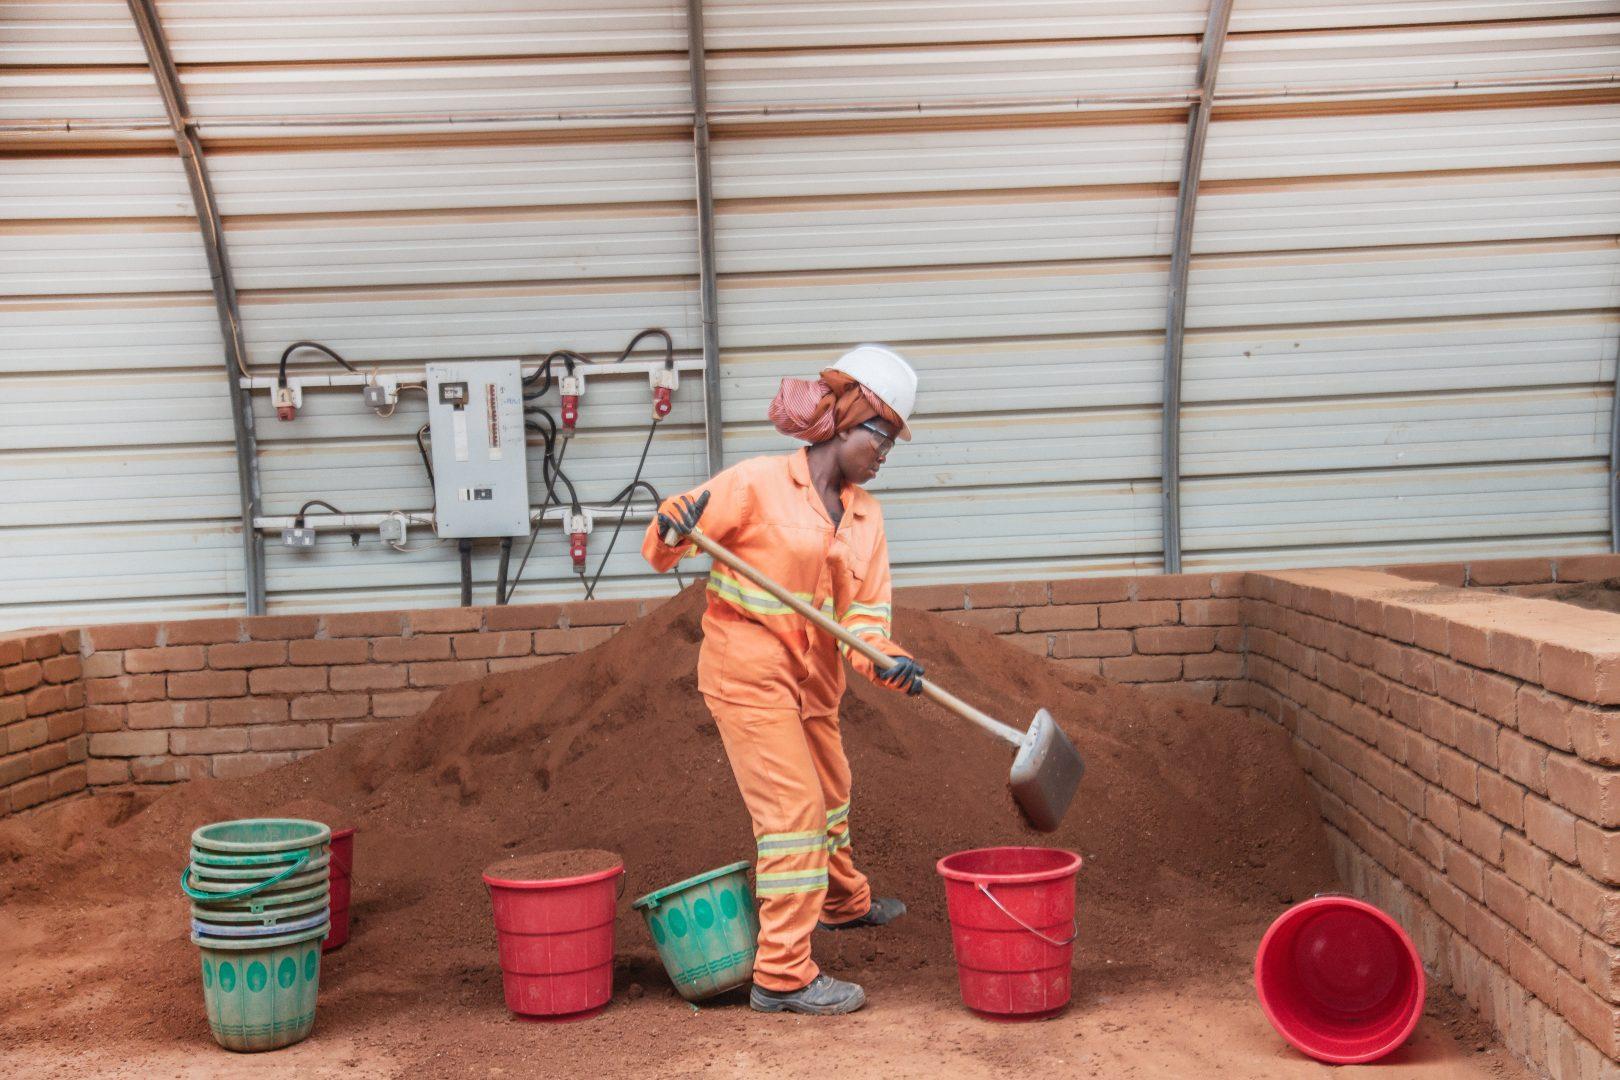 Female builder representing equality of gender investing